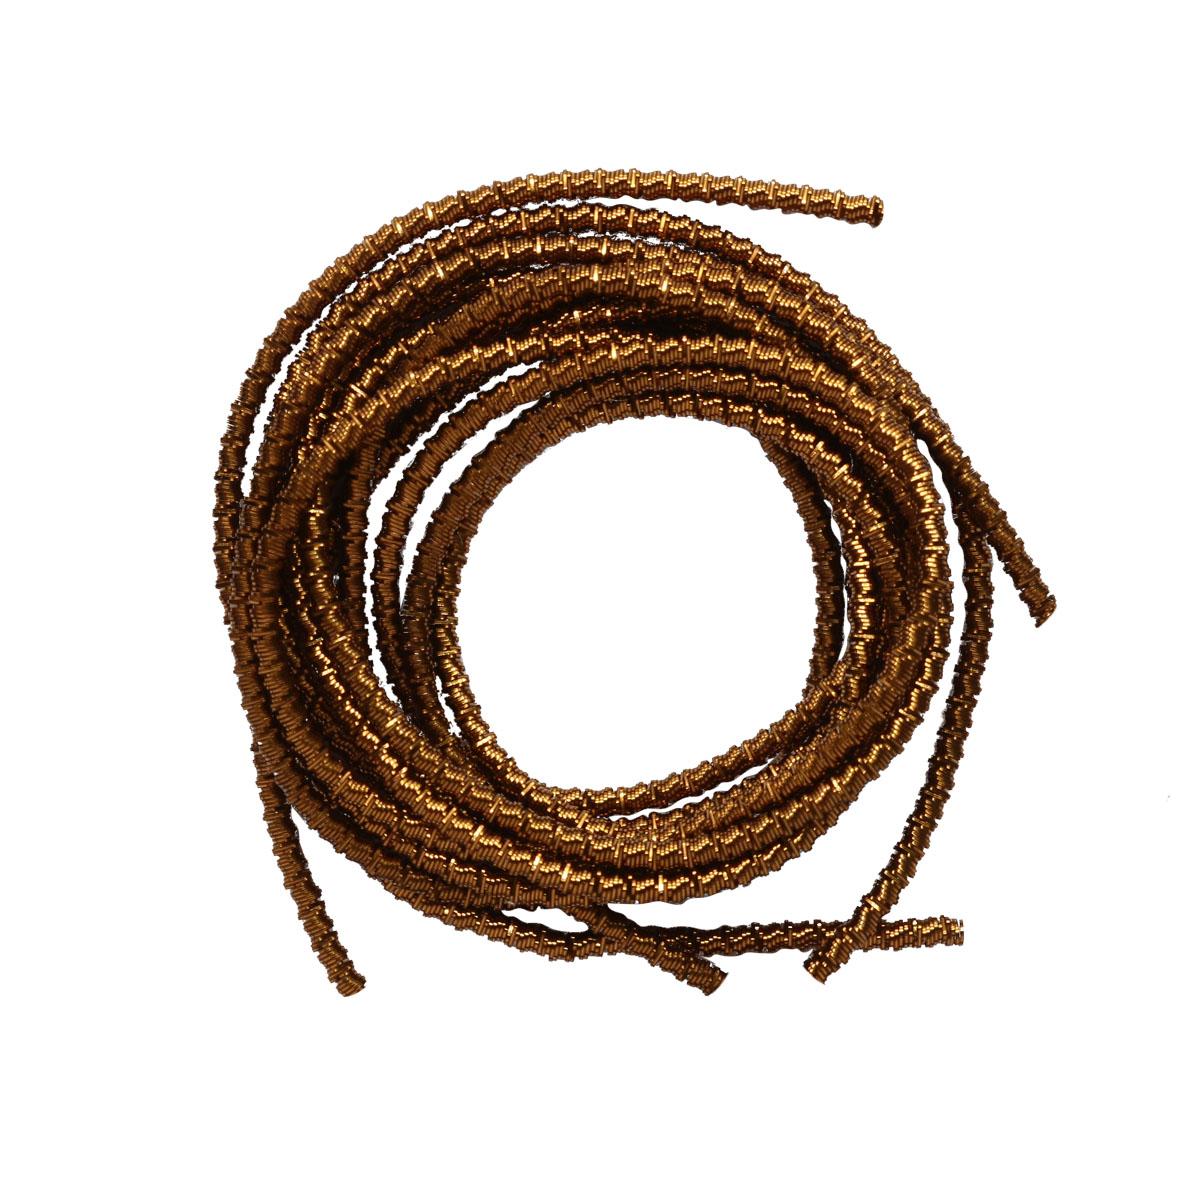 ТБ002НН2 Трунцал Бамбук бронза 2 мм, 5 грамм +/- 0,1 гр.